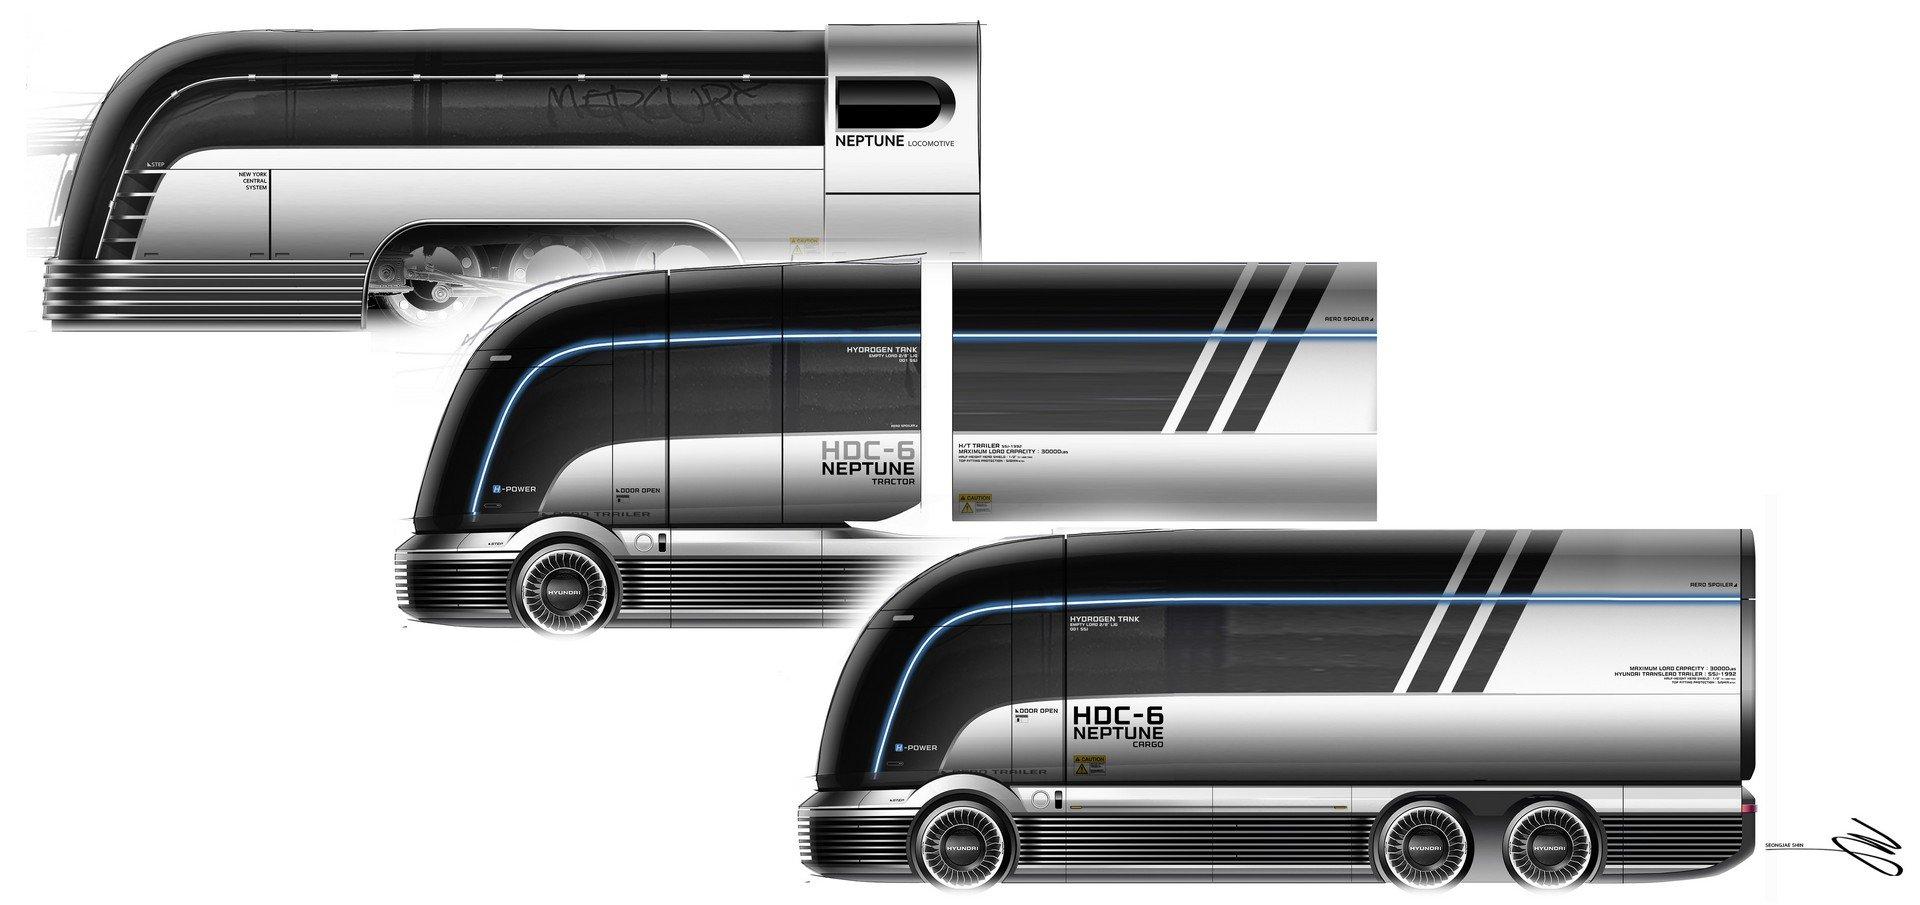 HDC-6 نبتون